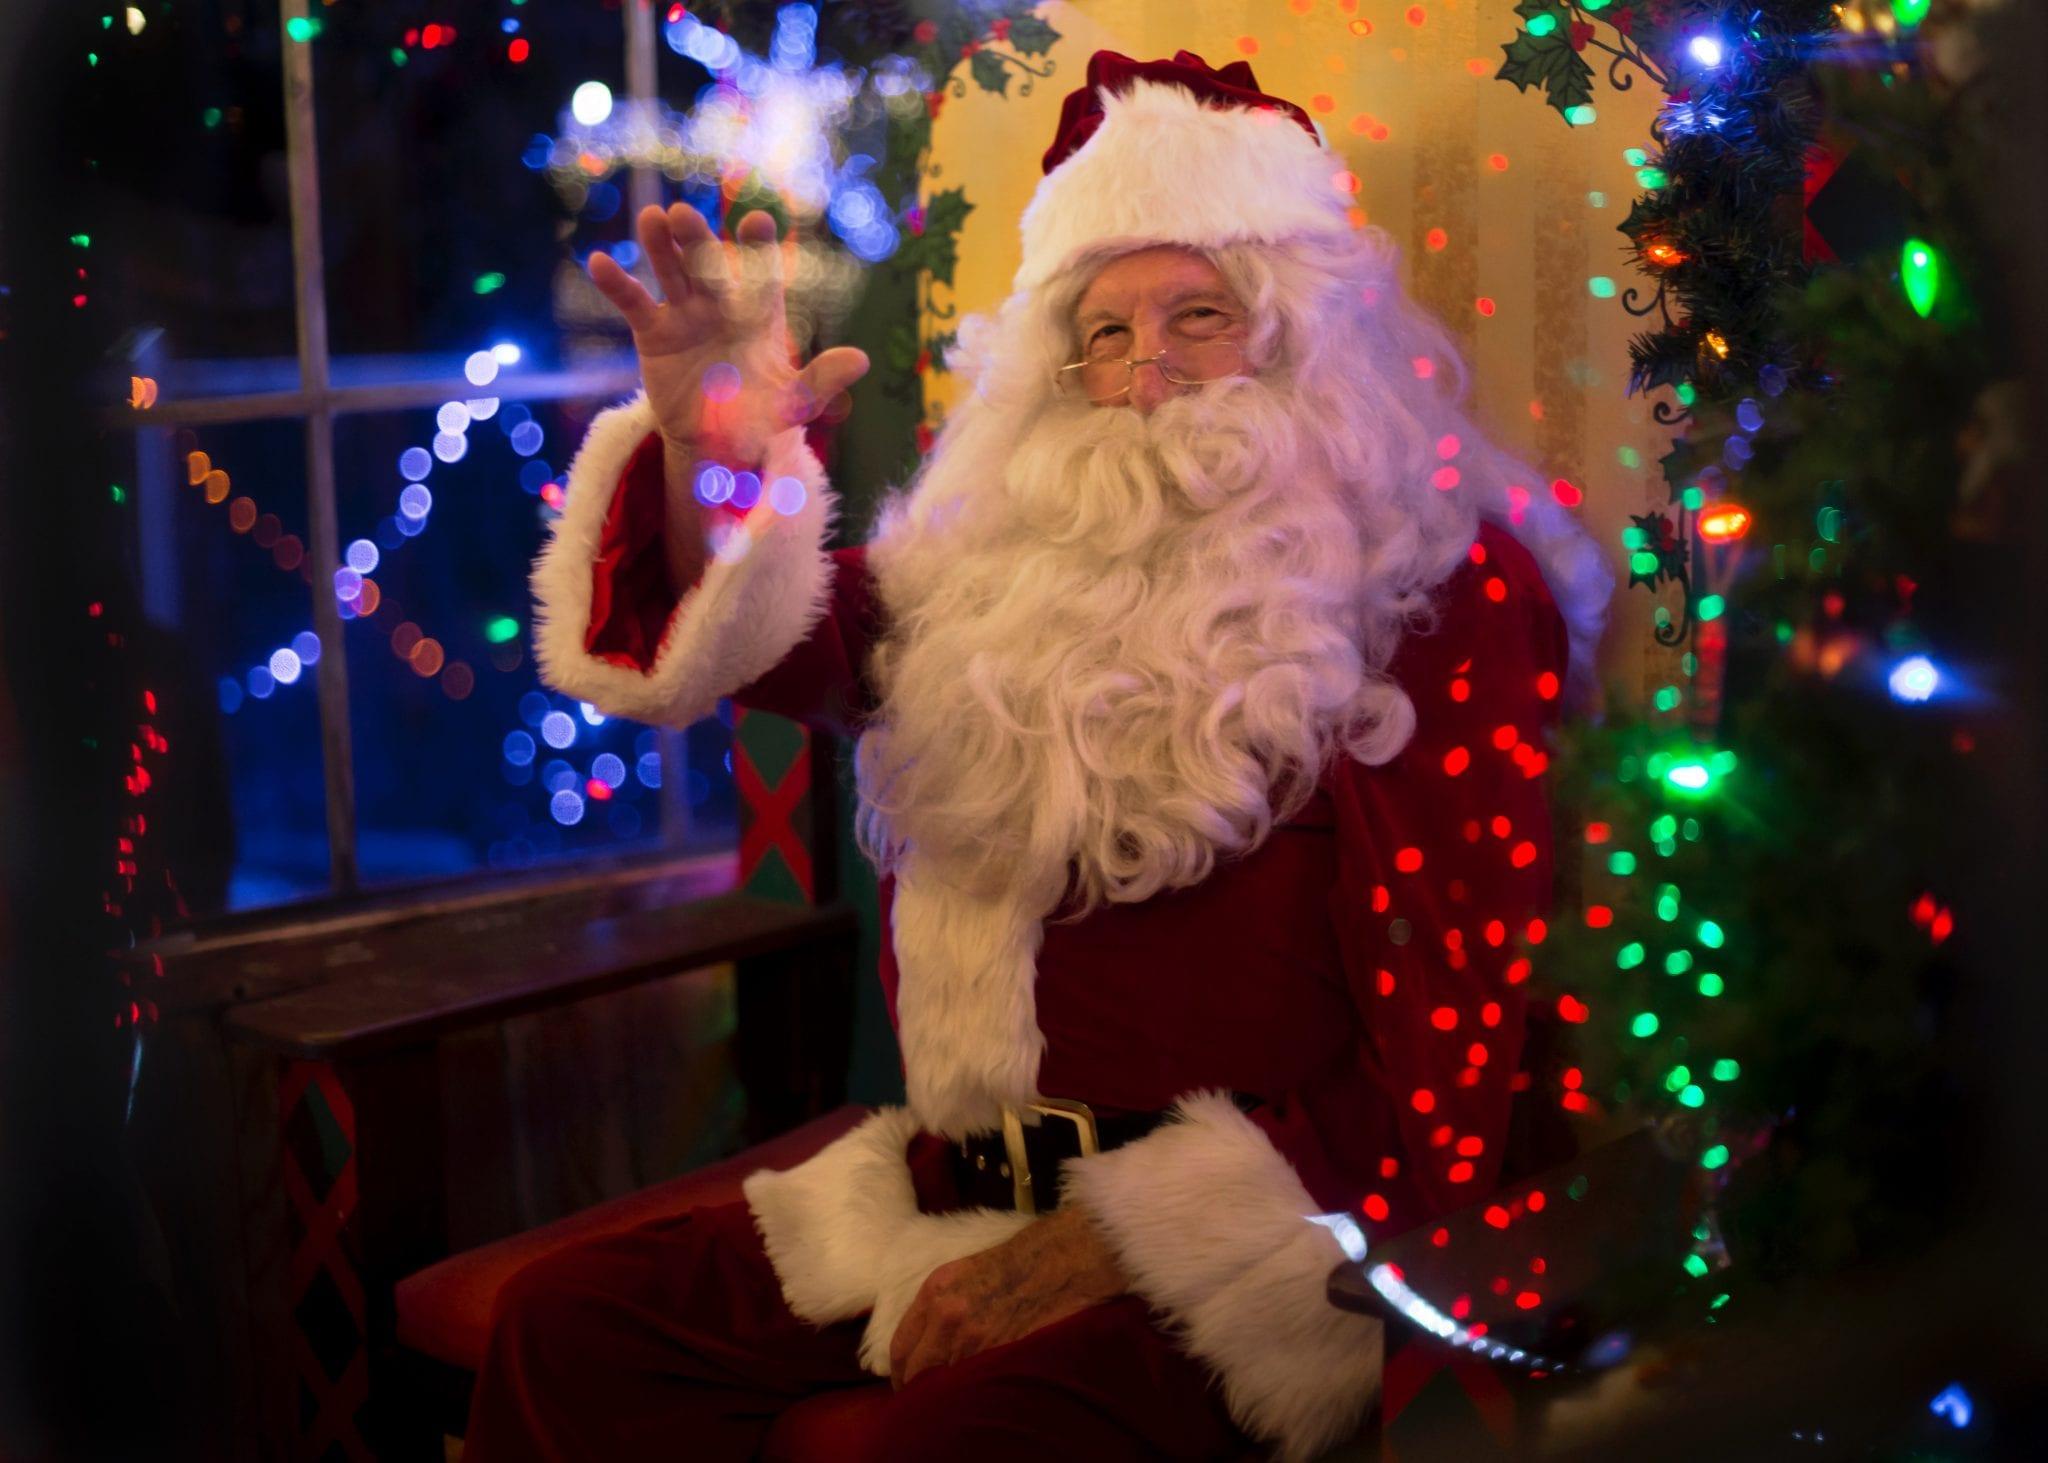 Por onde anda o Pai Natal?